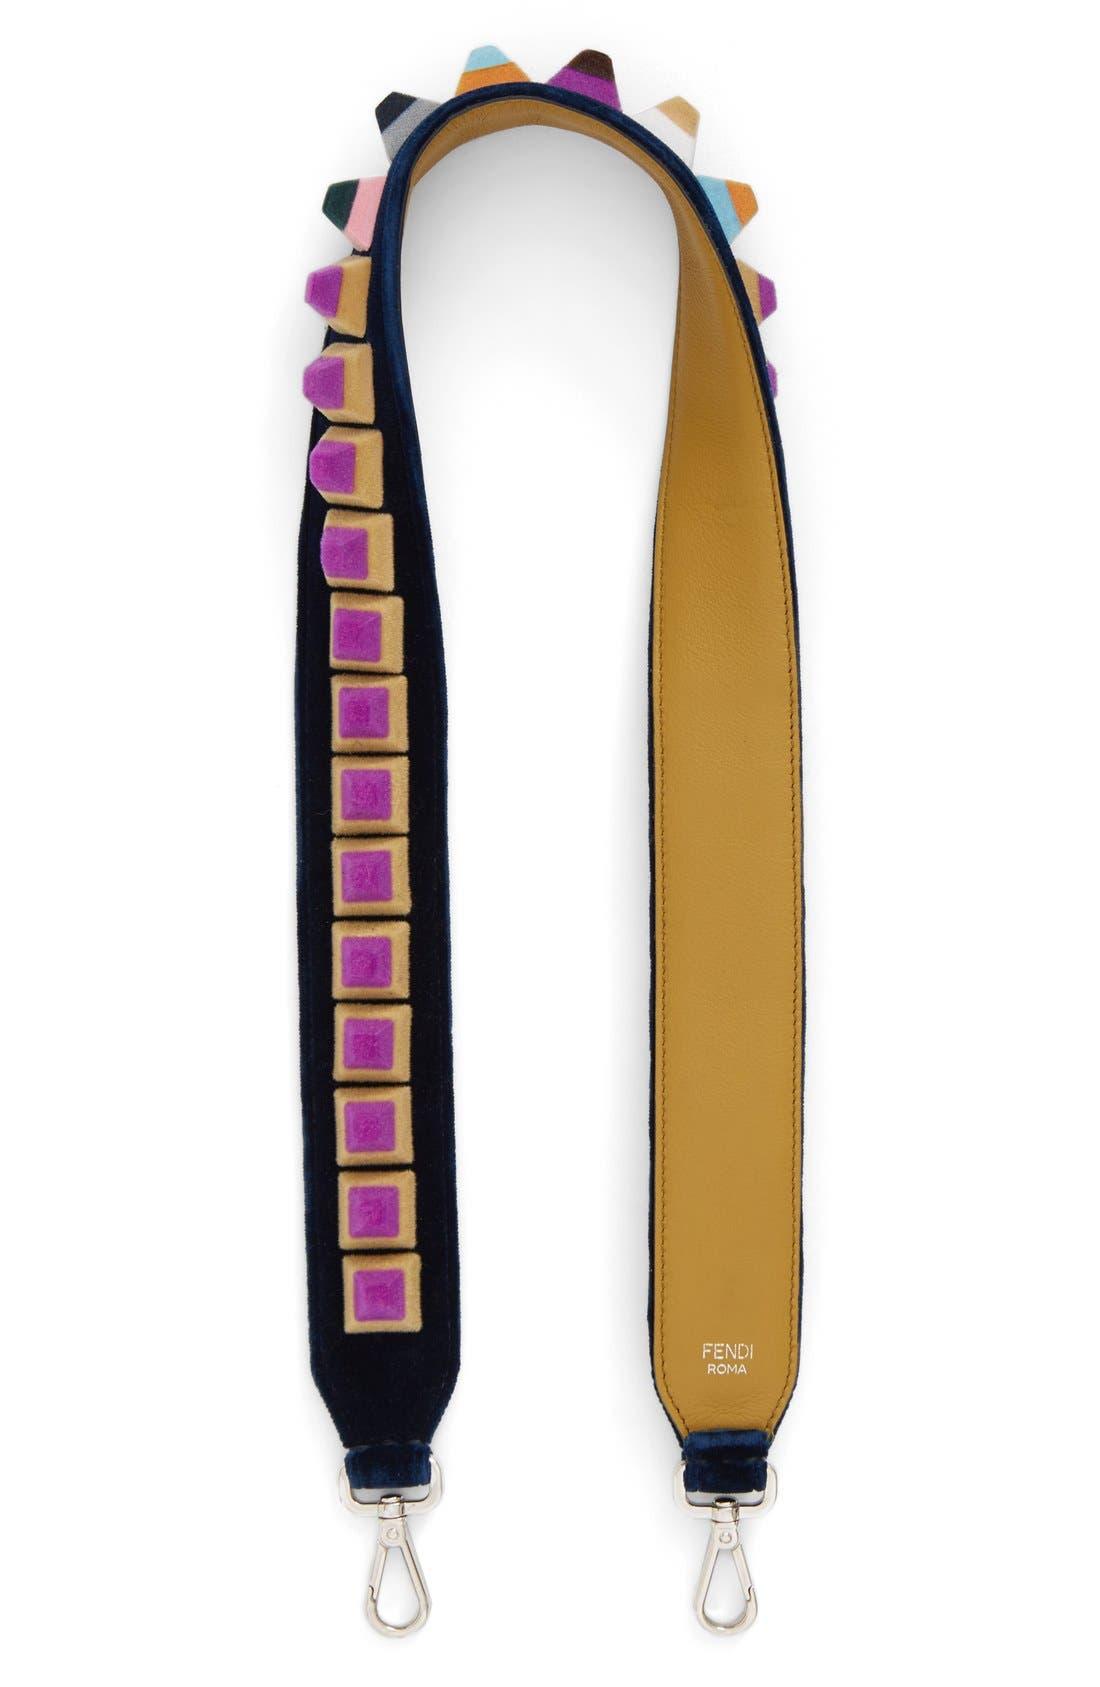 Studded Velvet Guitar Bag Strap,                             Main thumbnail 1, color,                             NAVY BLUE/ MUSTARD/ MULTICOLOR